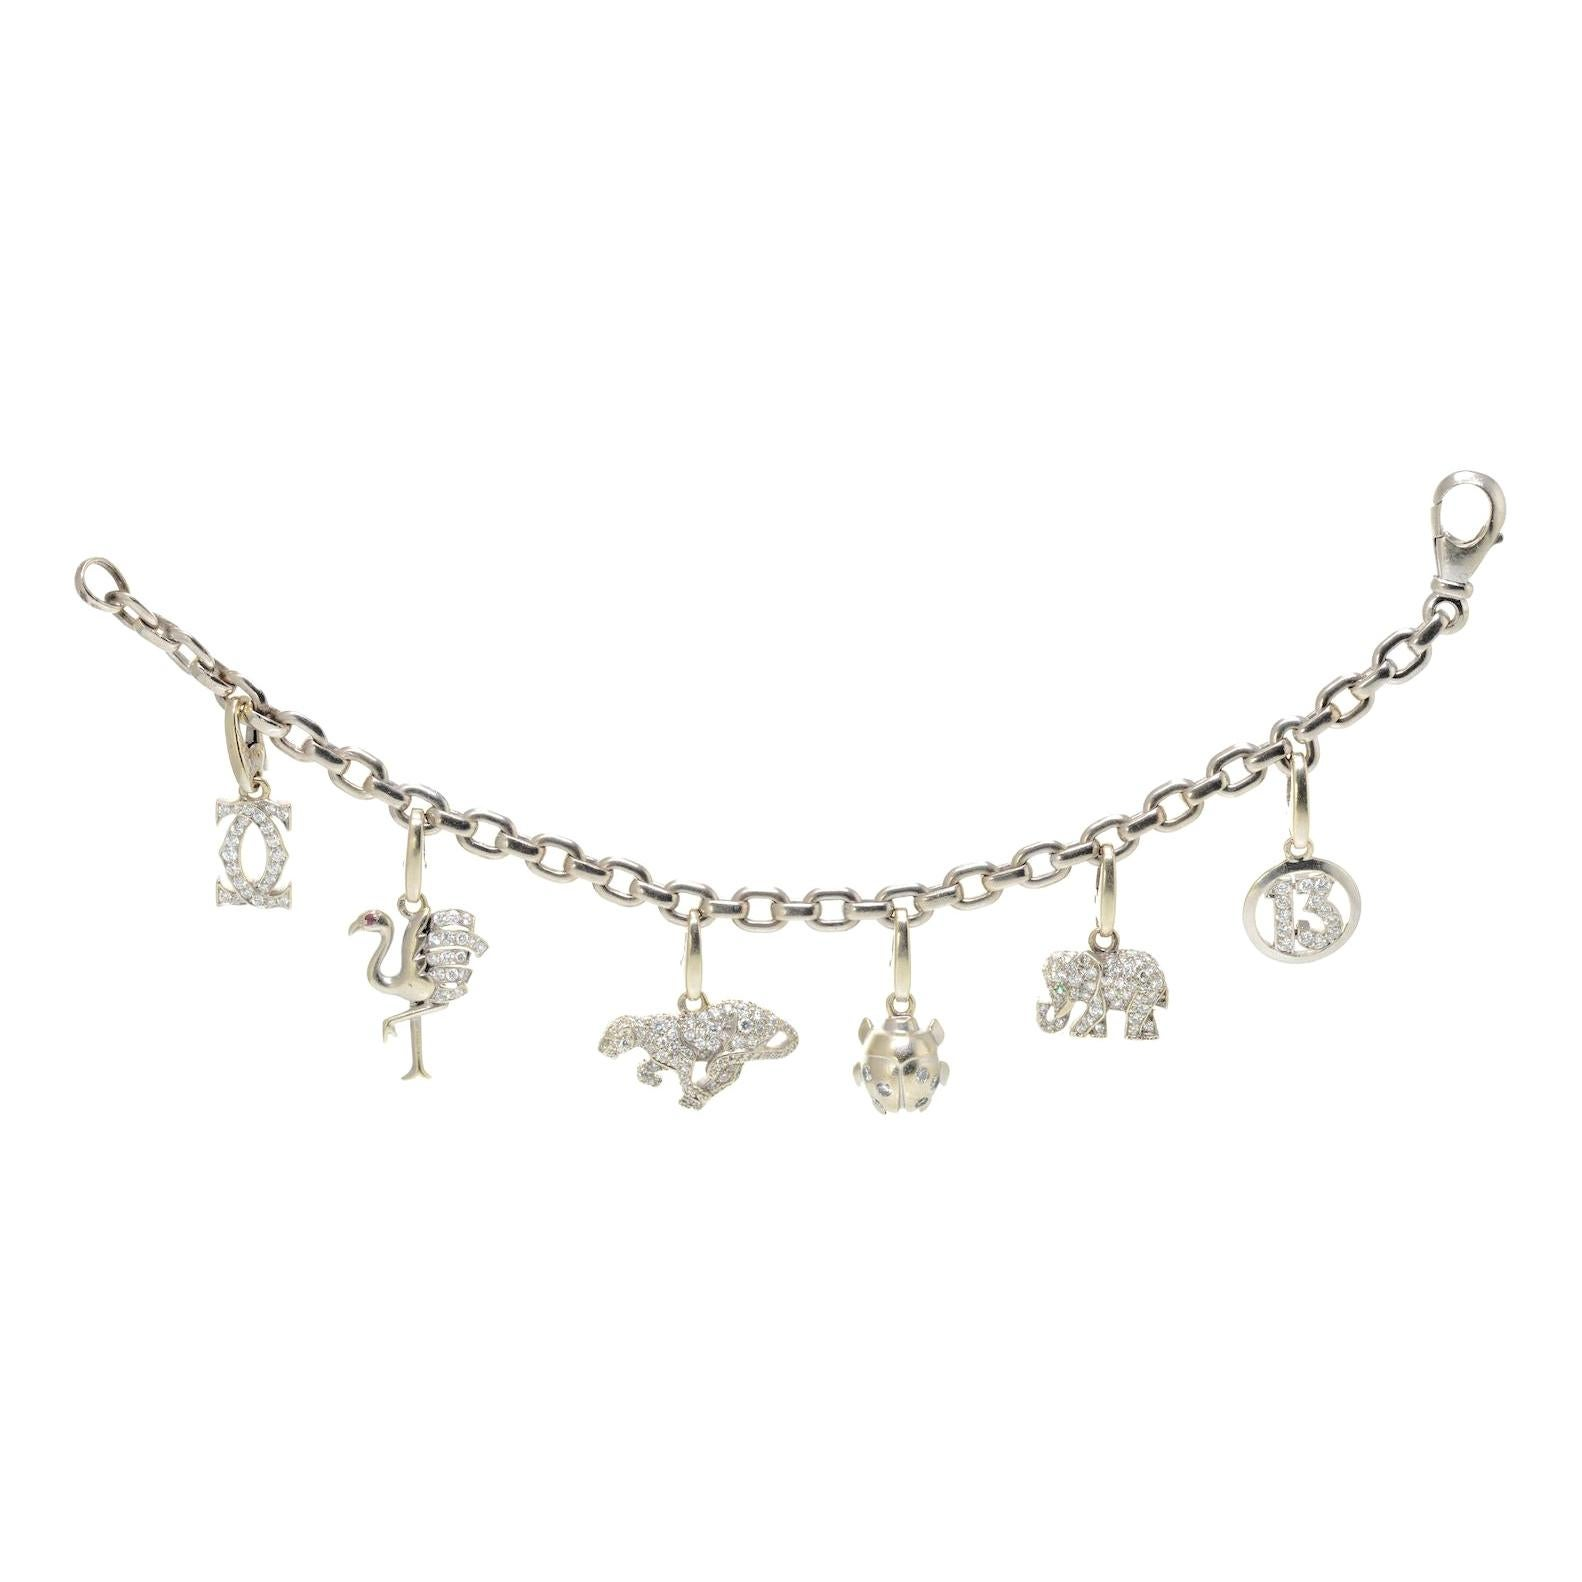 Cartier 18k White Gold Diamond Charm Bracelet